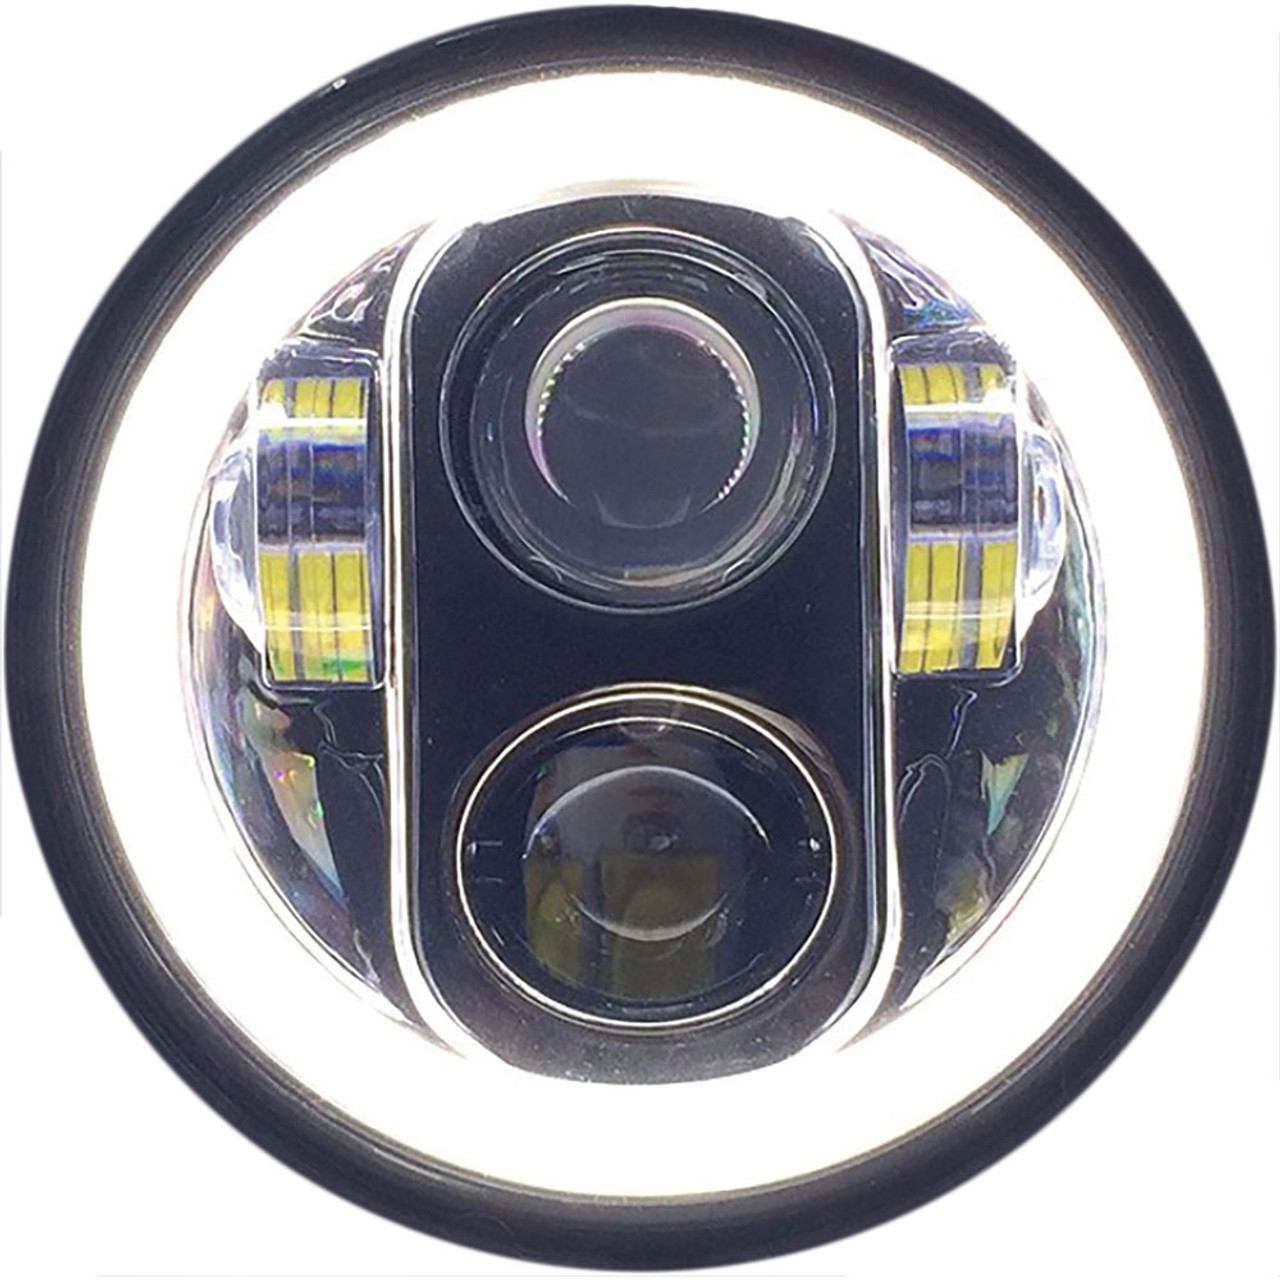 Pathfinder 5 3 4 Quot Led Headlight With Full Halo Black